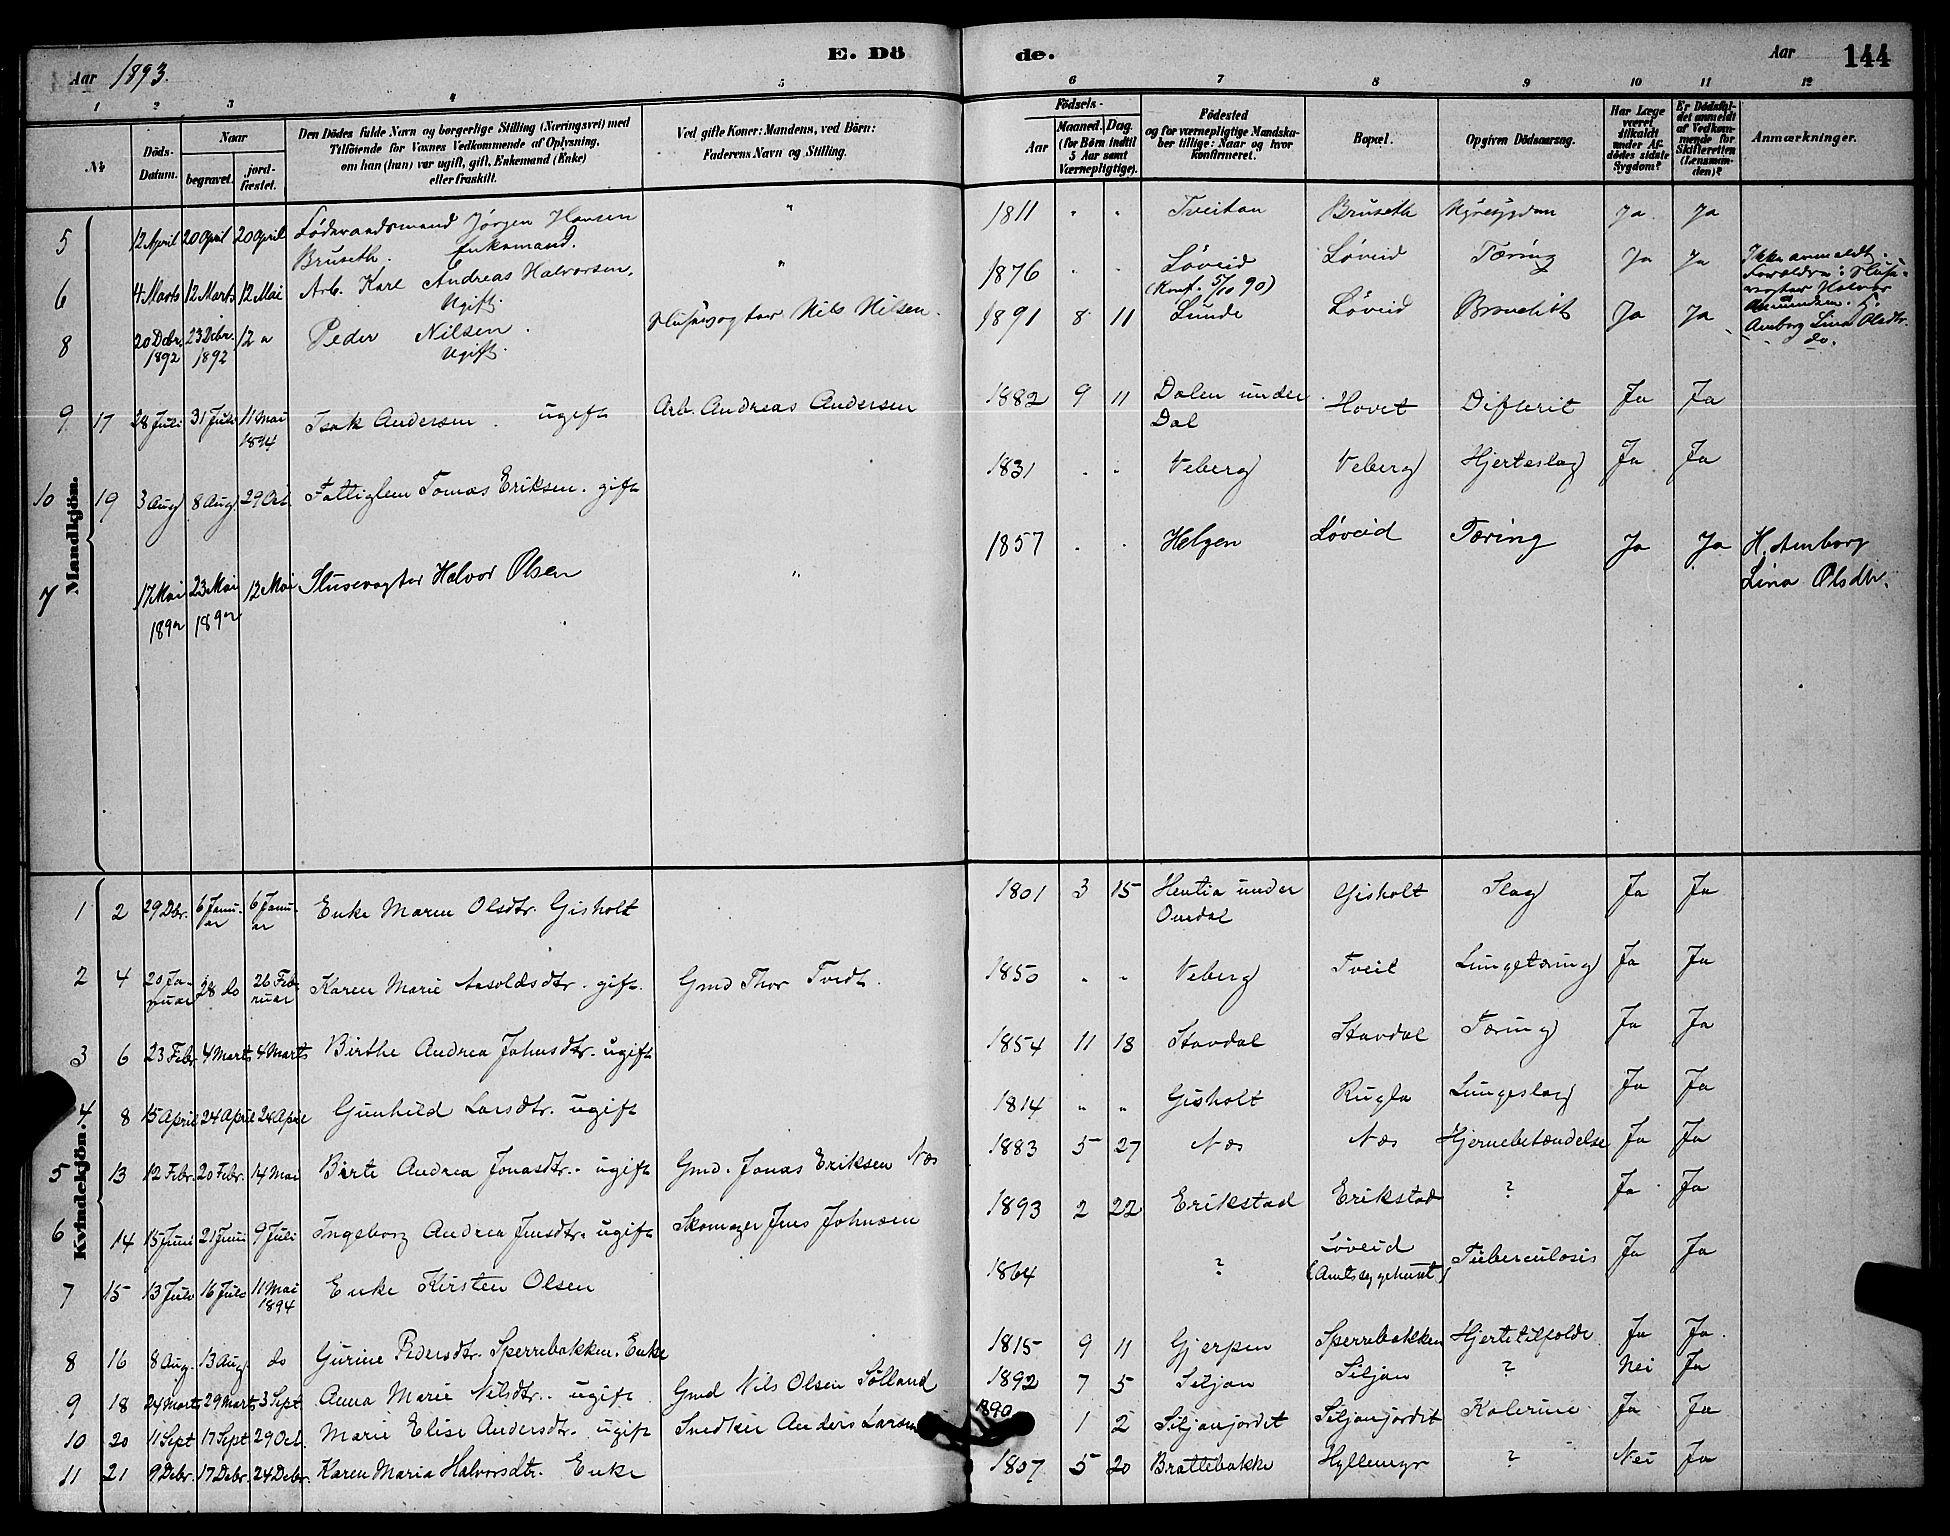 SAKO, Solum kirkebøker, G/Gb/L0003: Klokkerbok nr. II 3, 1880-1898, s. 144